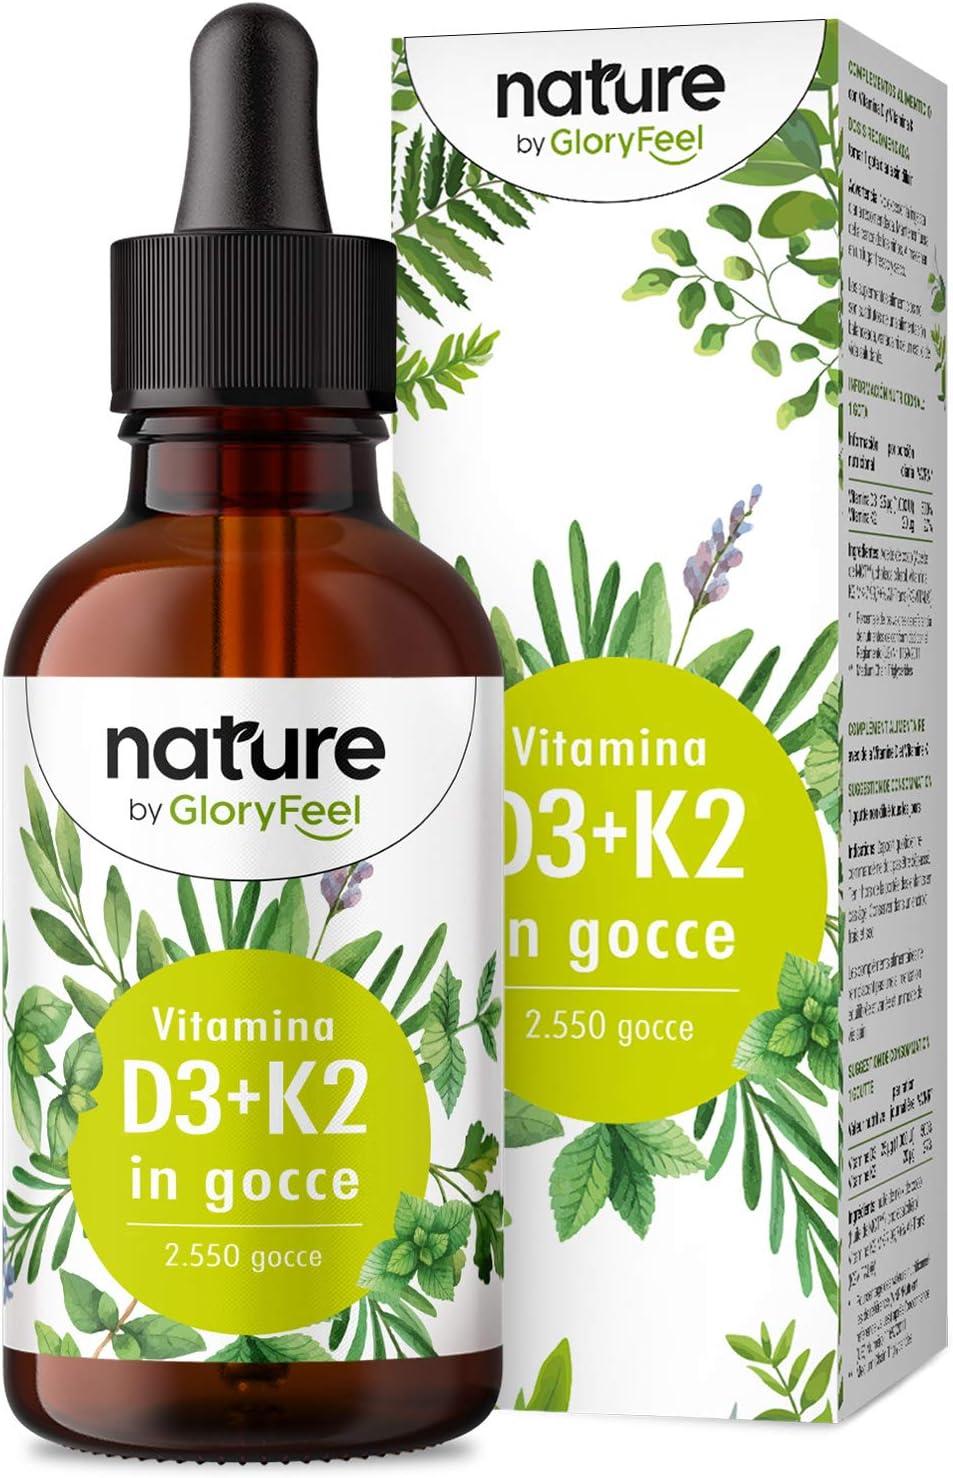 Vitamina d3 k2 75ml in gocce, vitamina d3 colecalciferolo 1000 ui per goccia + vitamina k2 mk-7 menachinone ka